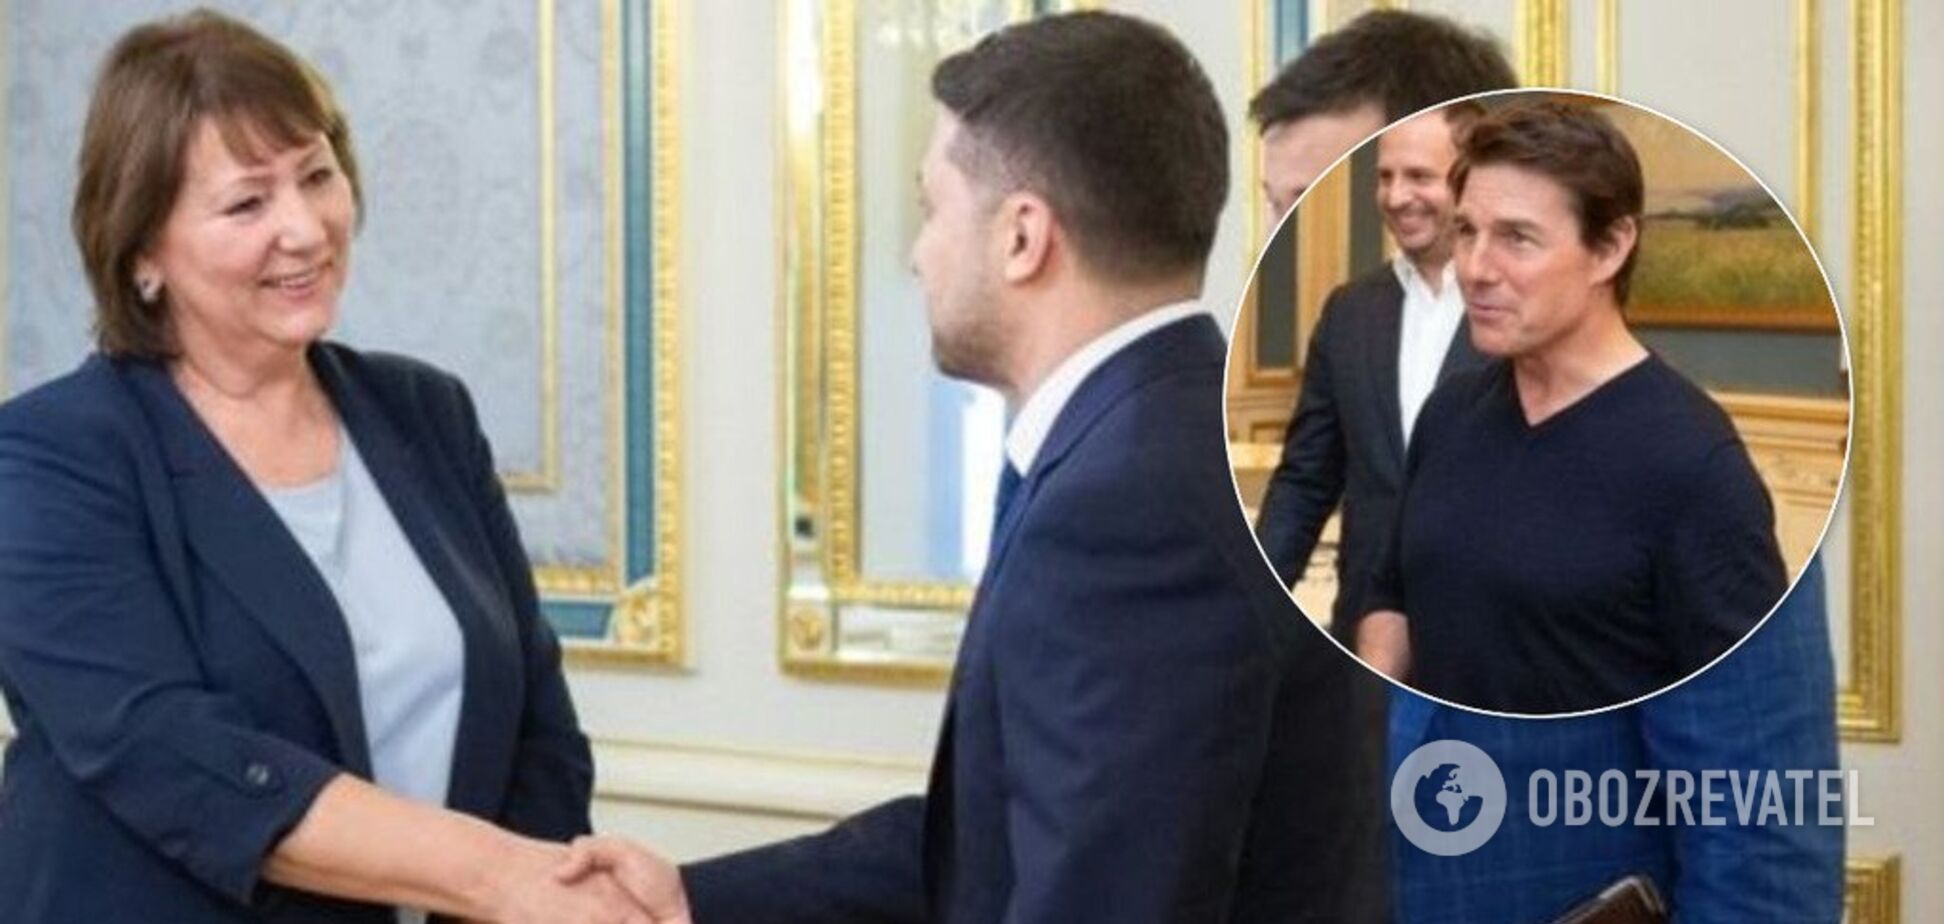 Глава ВСУ пожаловалась на Зеленского из-за Тома Круза